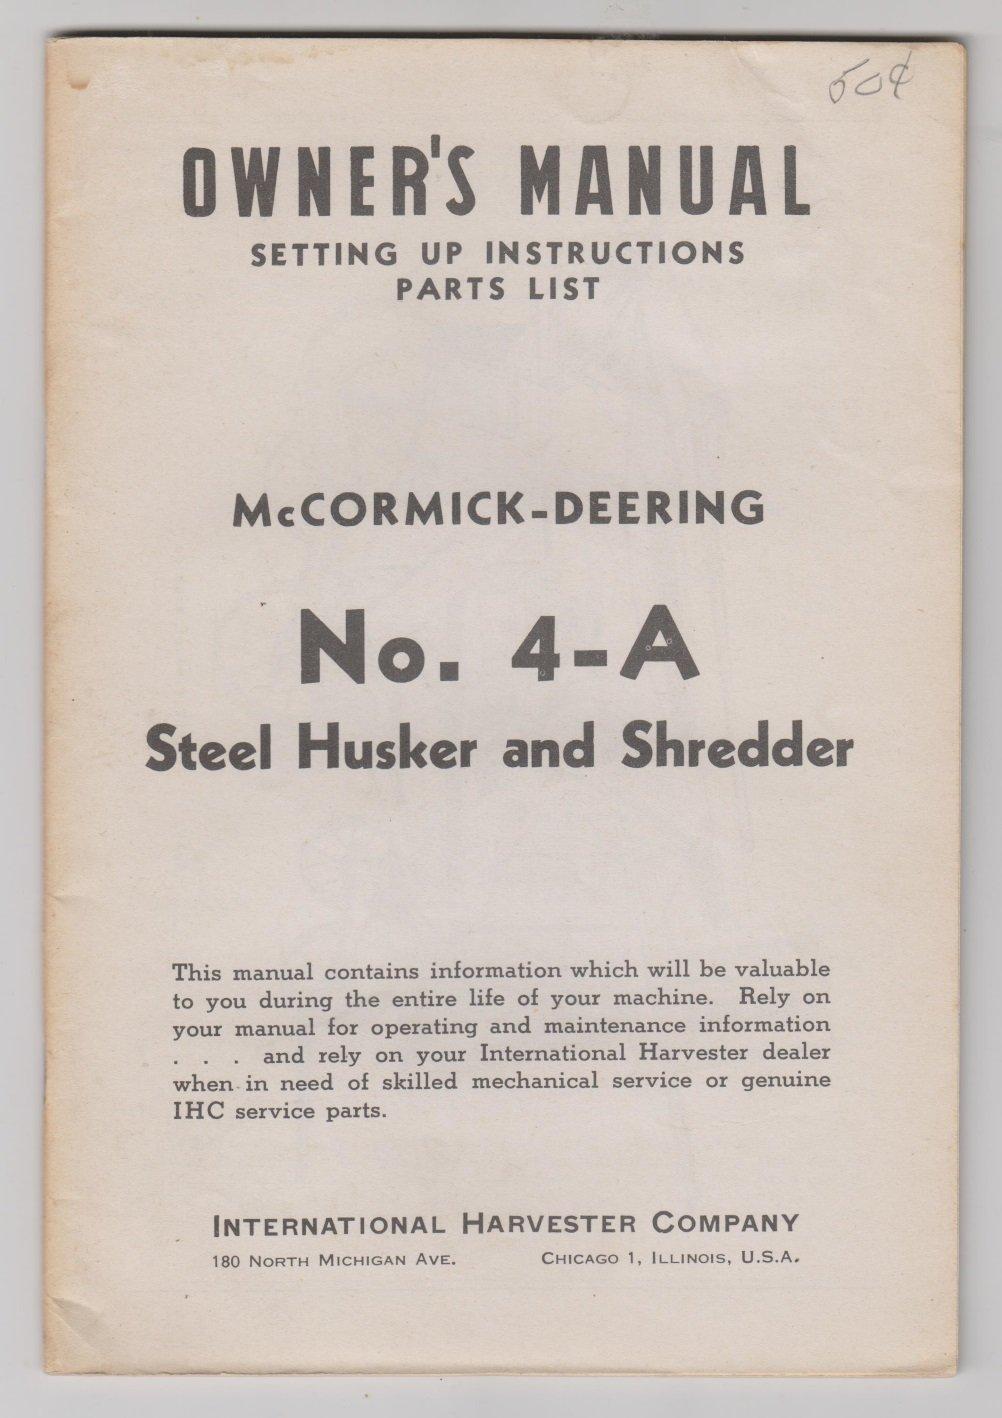 Manual IH mccormick deering steel husker and shredder manual no 4-A